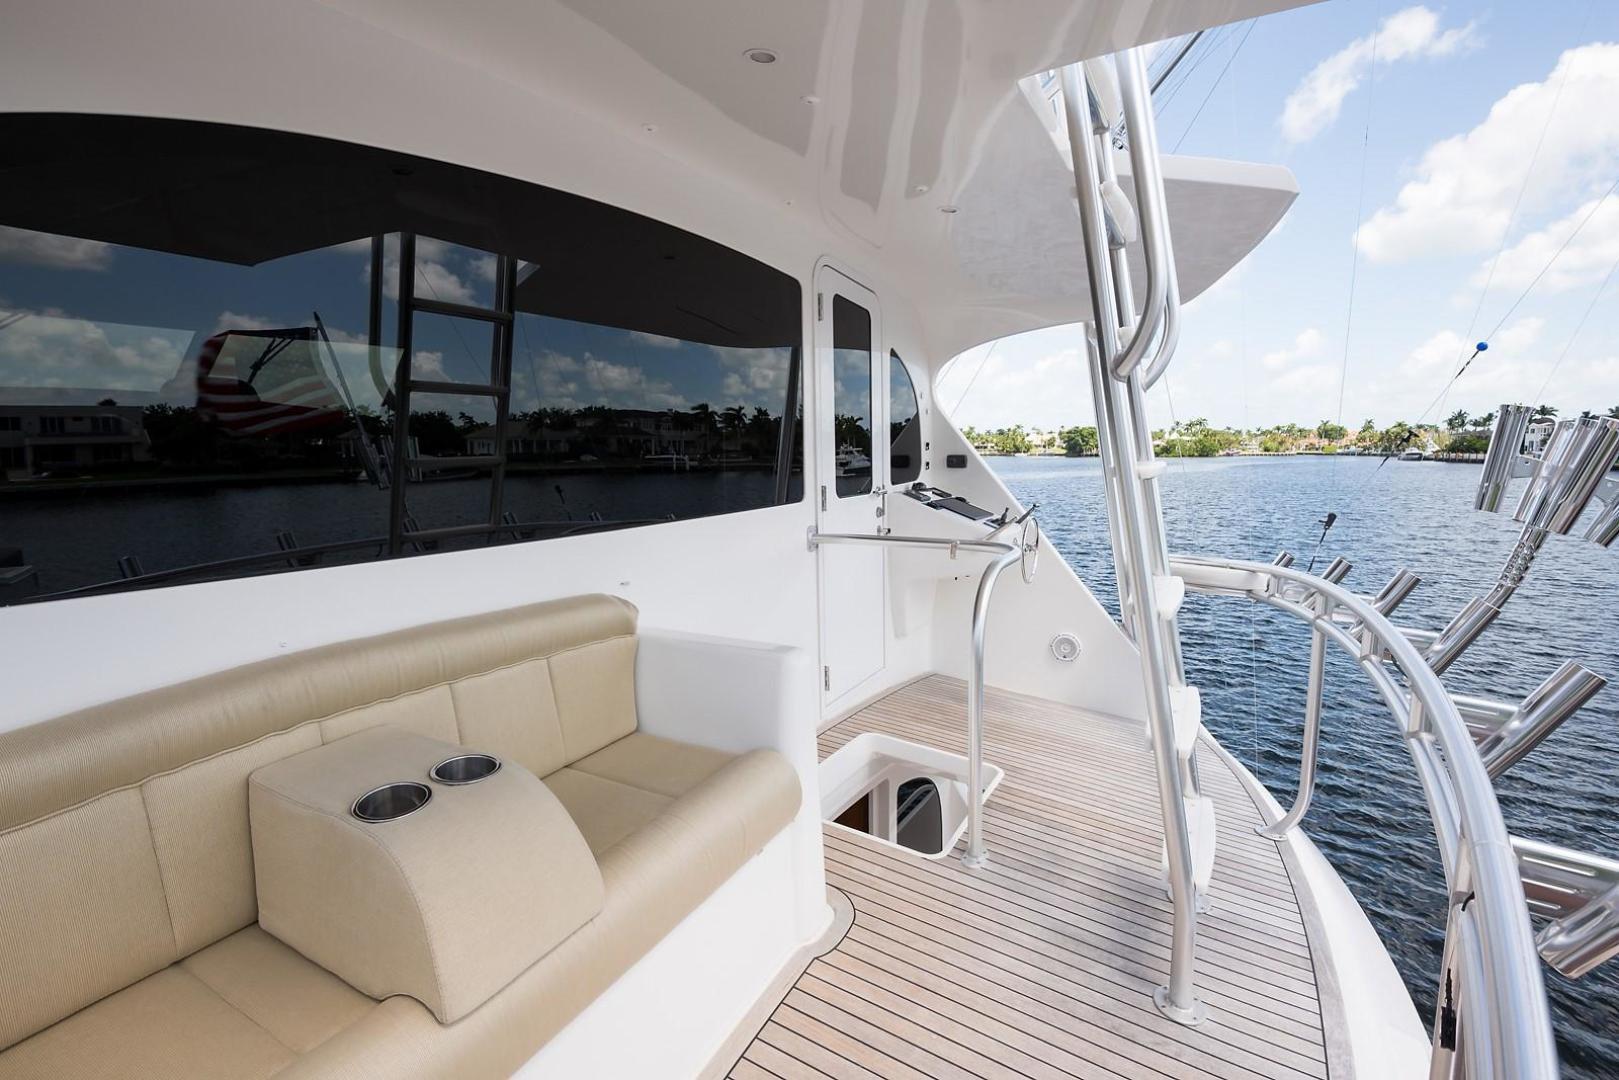 Viking-Enclosed 2013-No Name 82 Miami-Florida-United States-Enclosed Flybridge Aft Deck-1324716 | Thumbnail